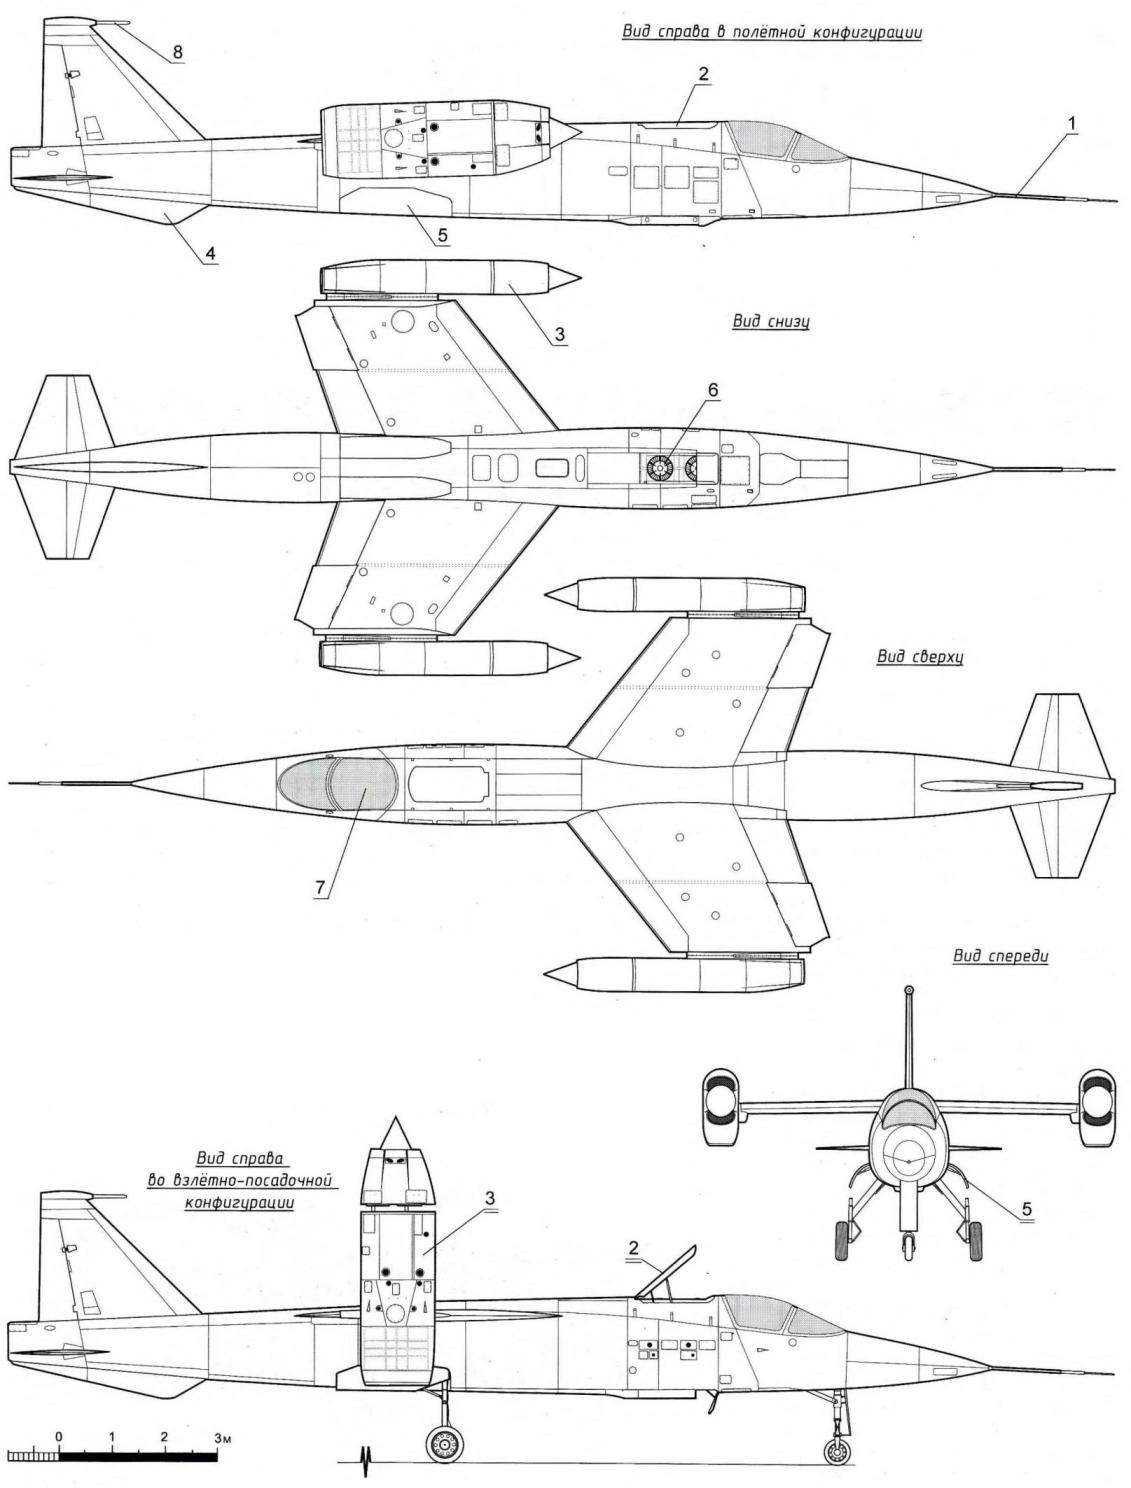 VJ-101